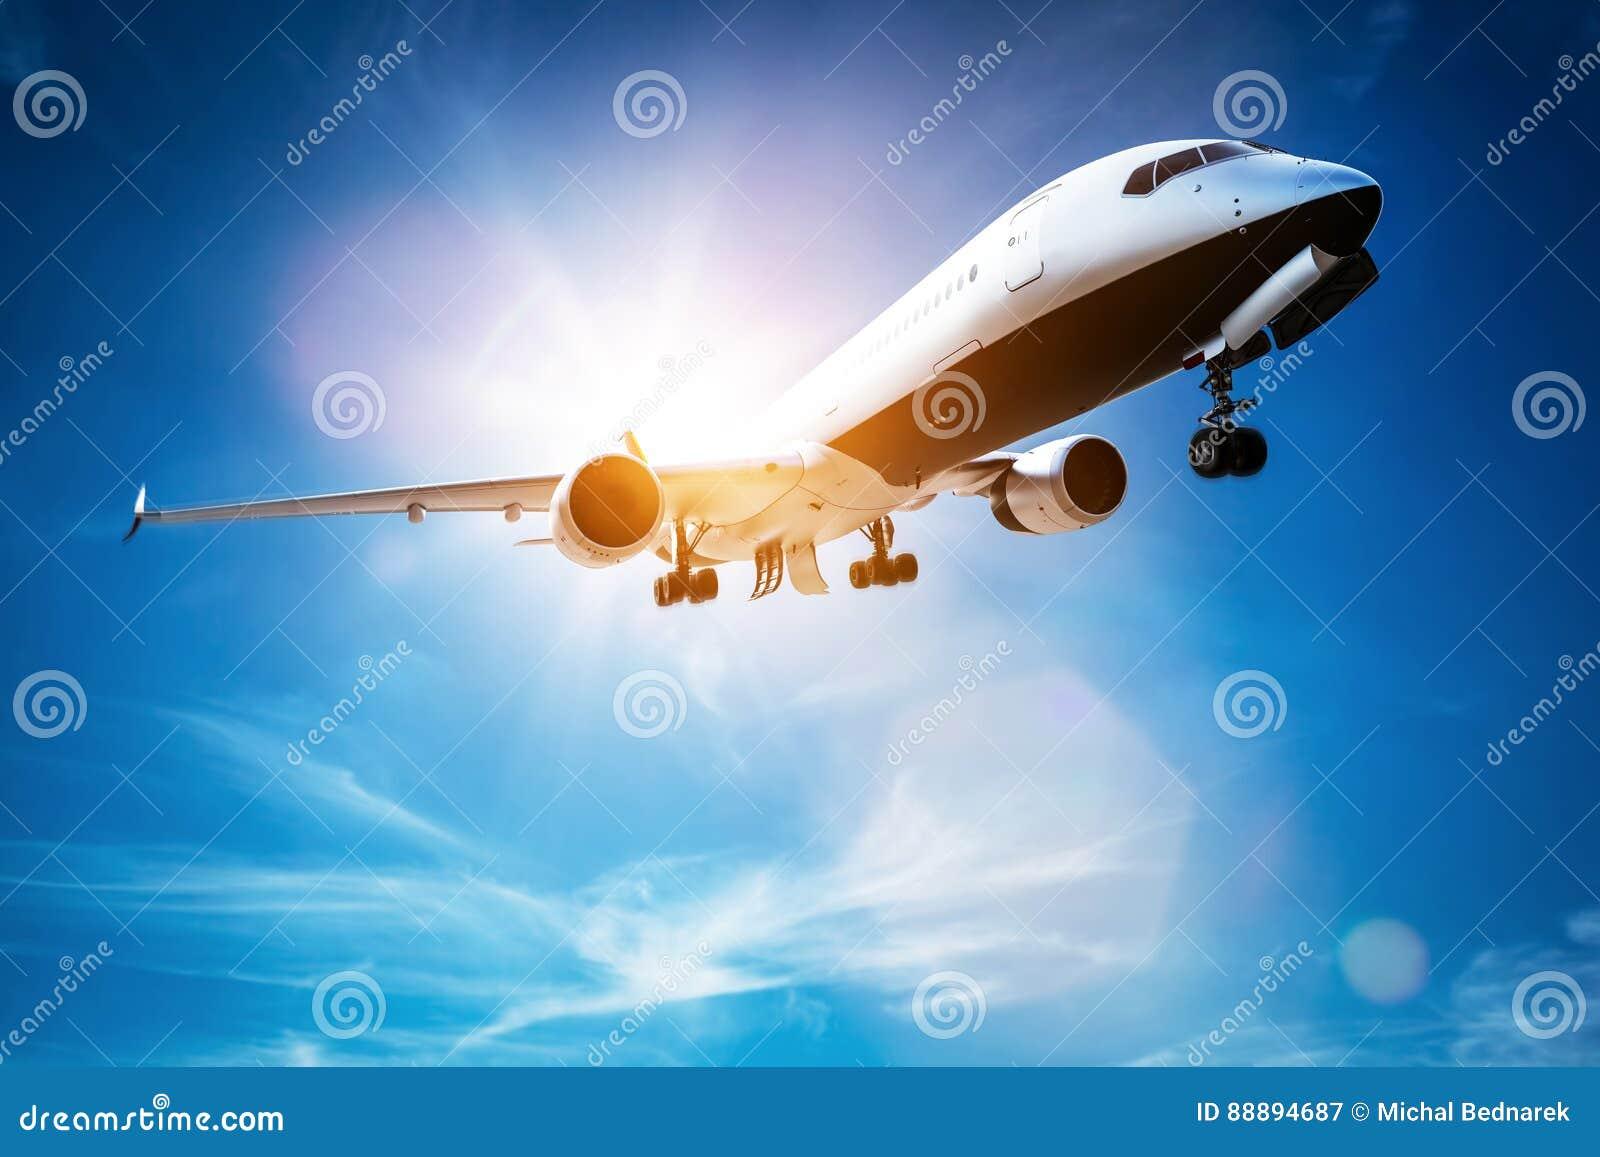 Passenger airplane taking off, sunny blue sky.